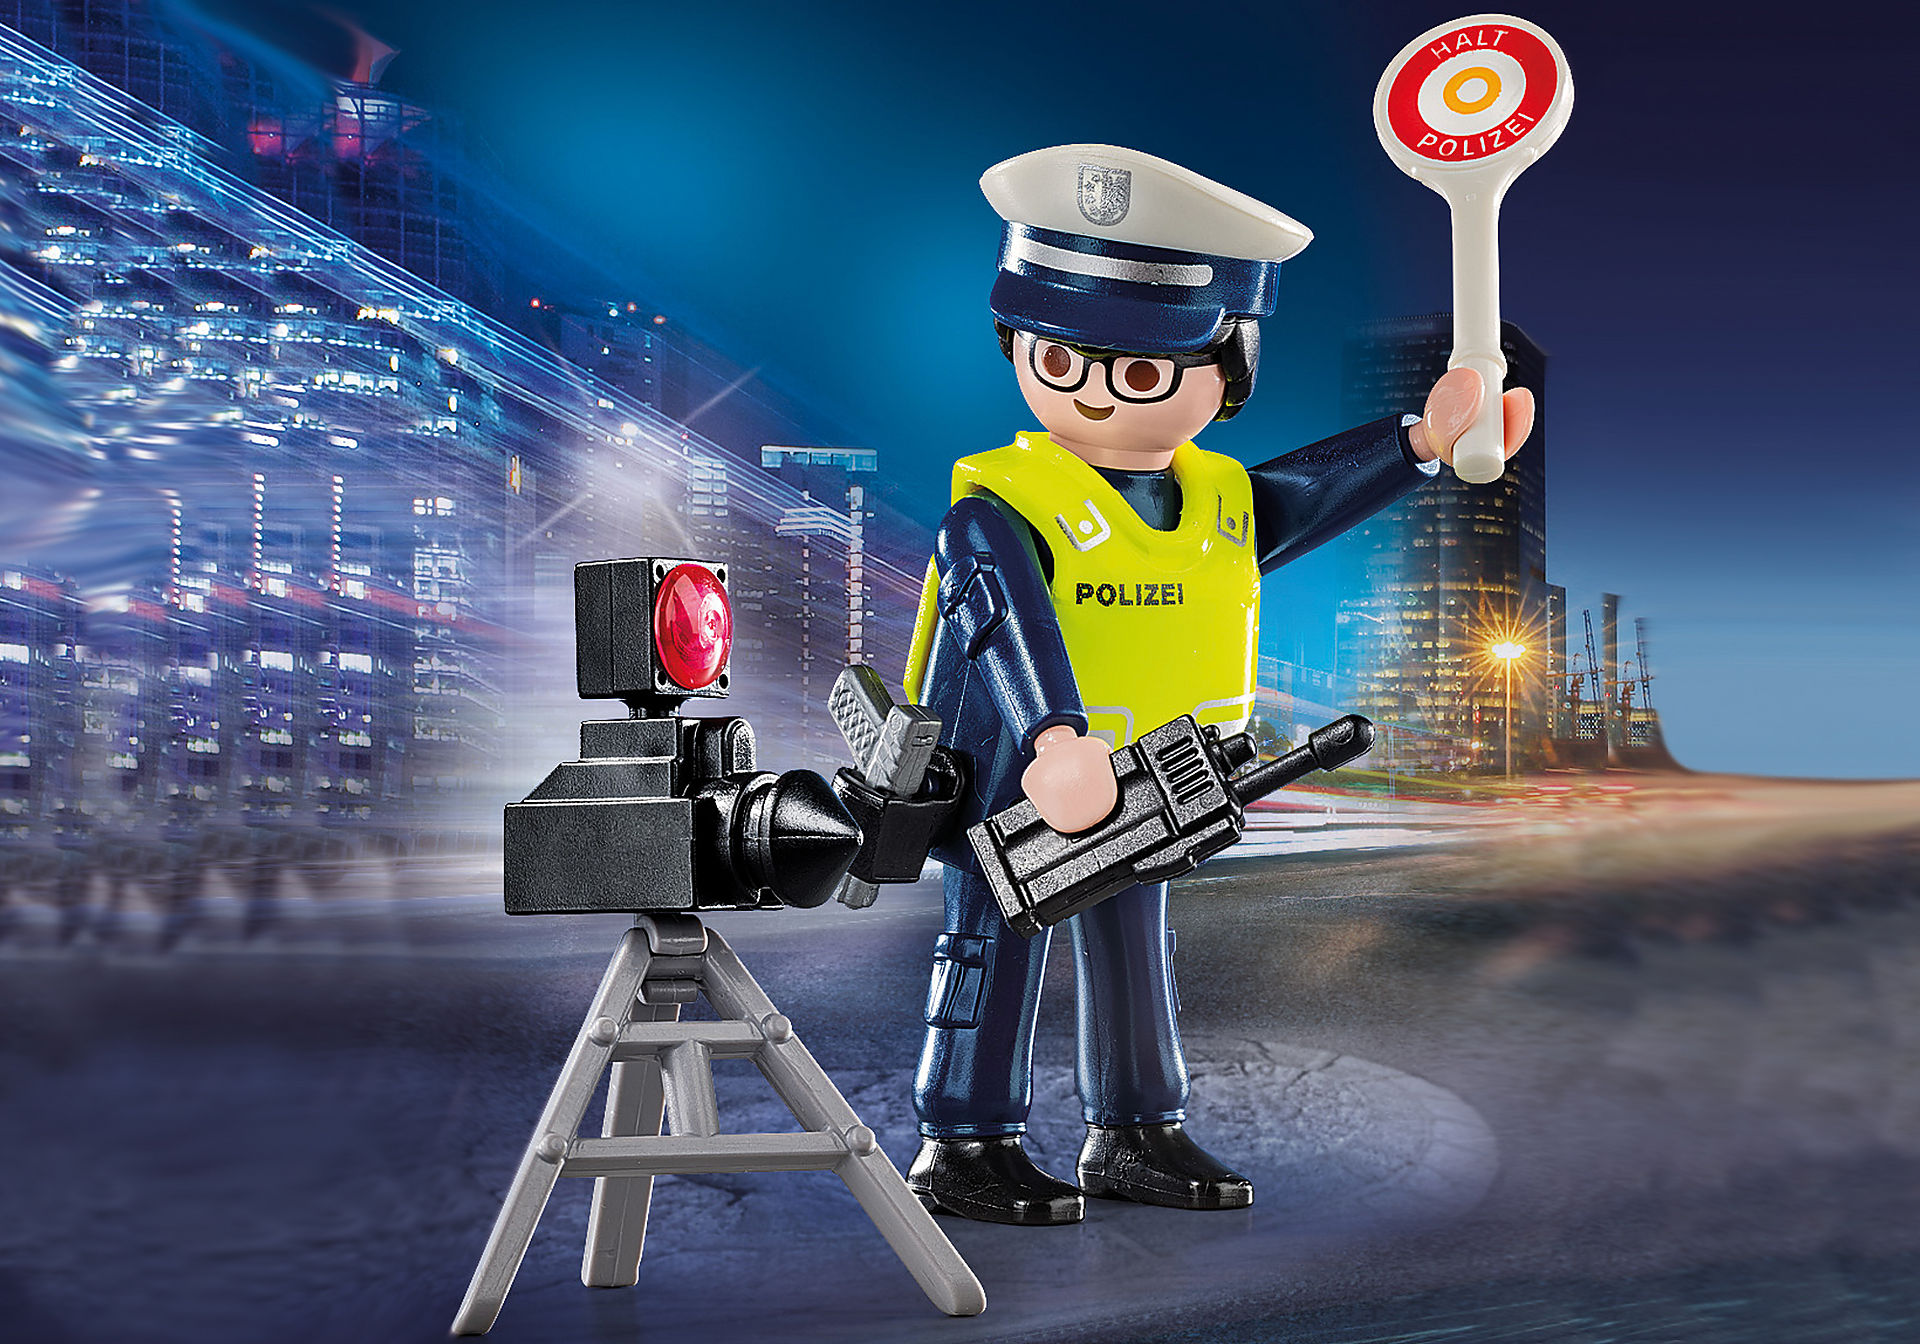 70304 Policier avec radar zoom image1